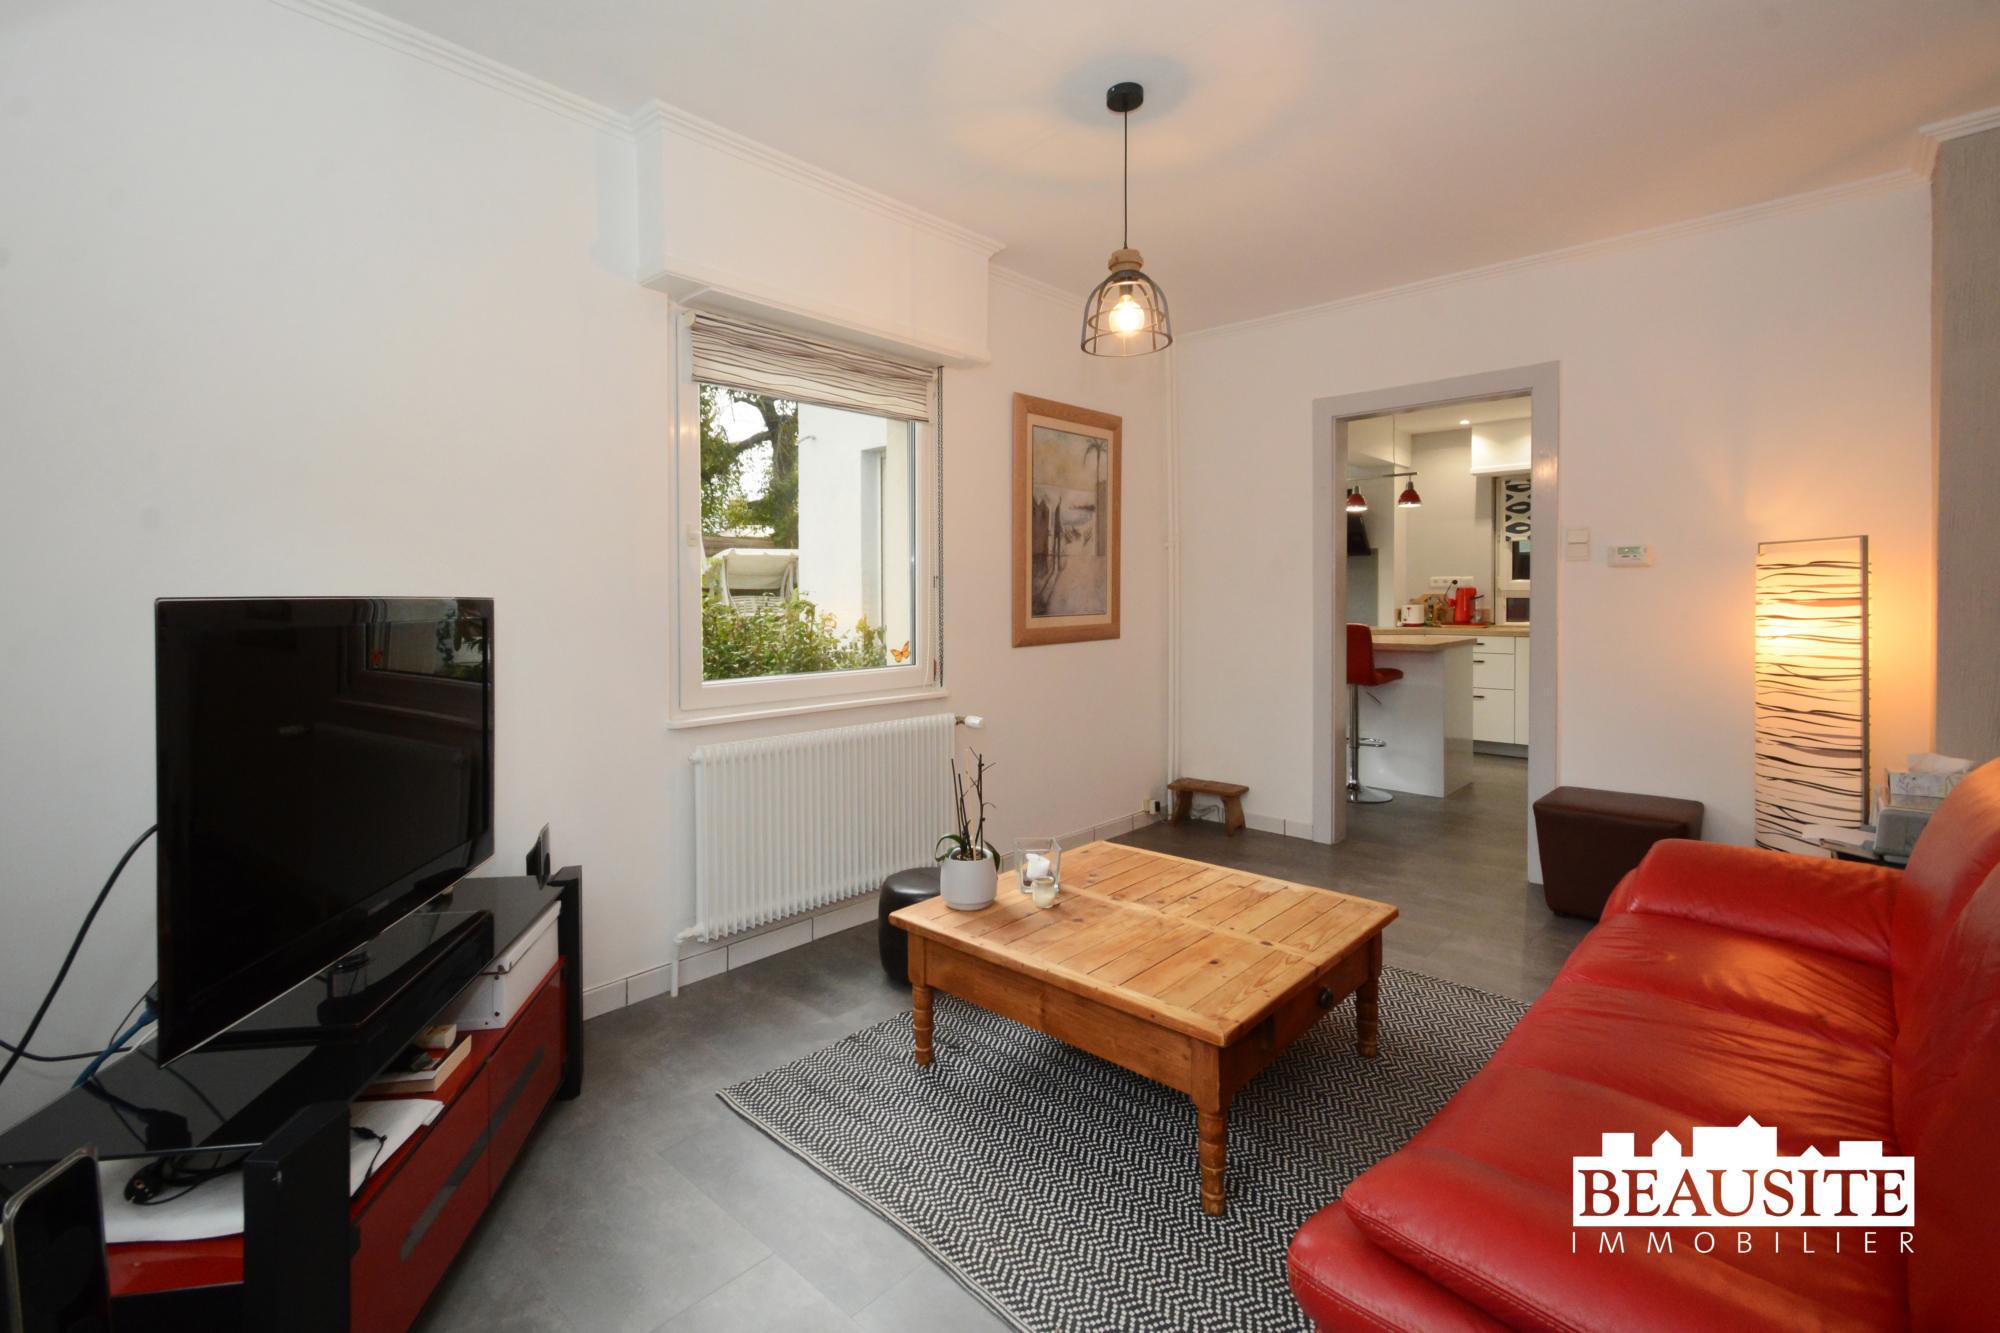 [Haddock] Une superbe maison avec piscine en plein cœur du village - Weyersheim - nos ventes - Beausite Immobilier 7